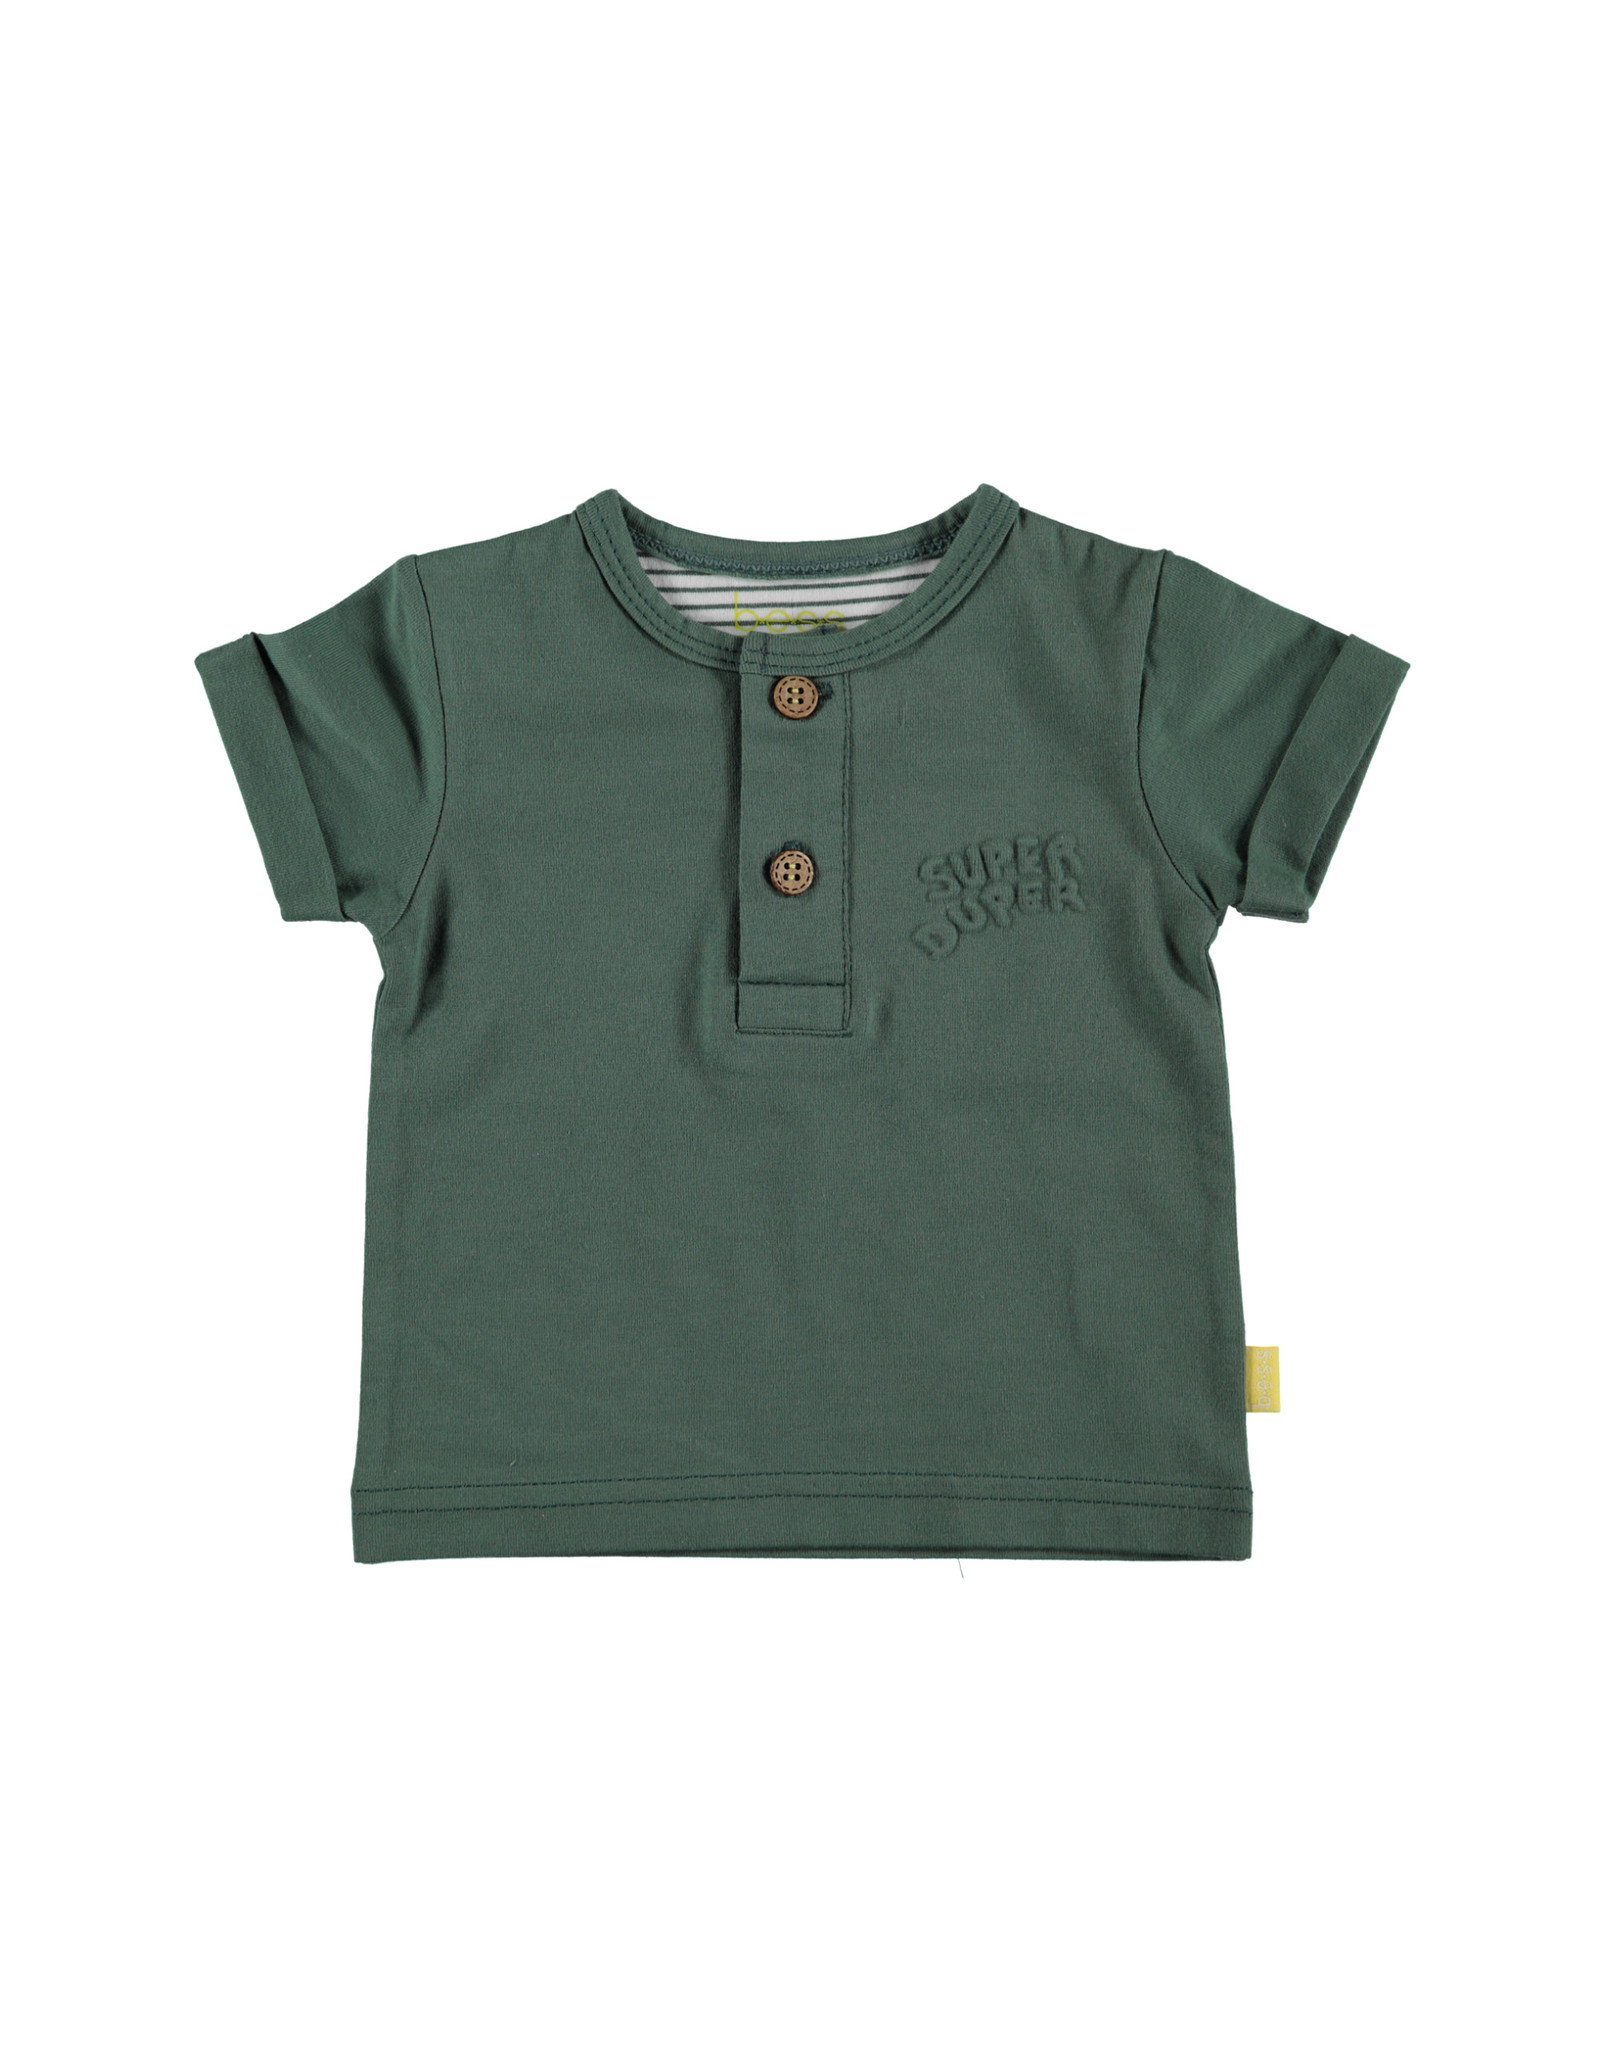 B.E.S.S. Shirt sh.sl. Henley, Green